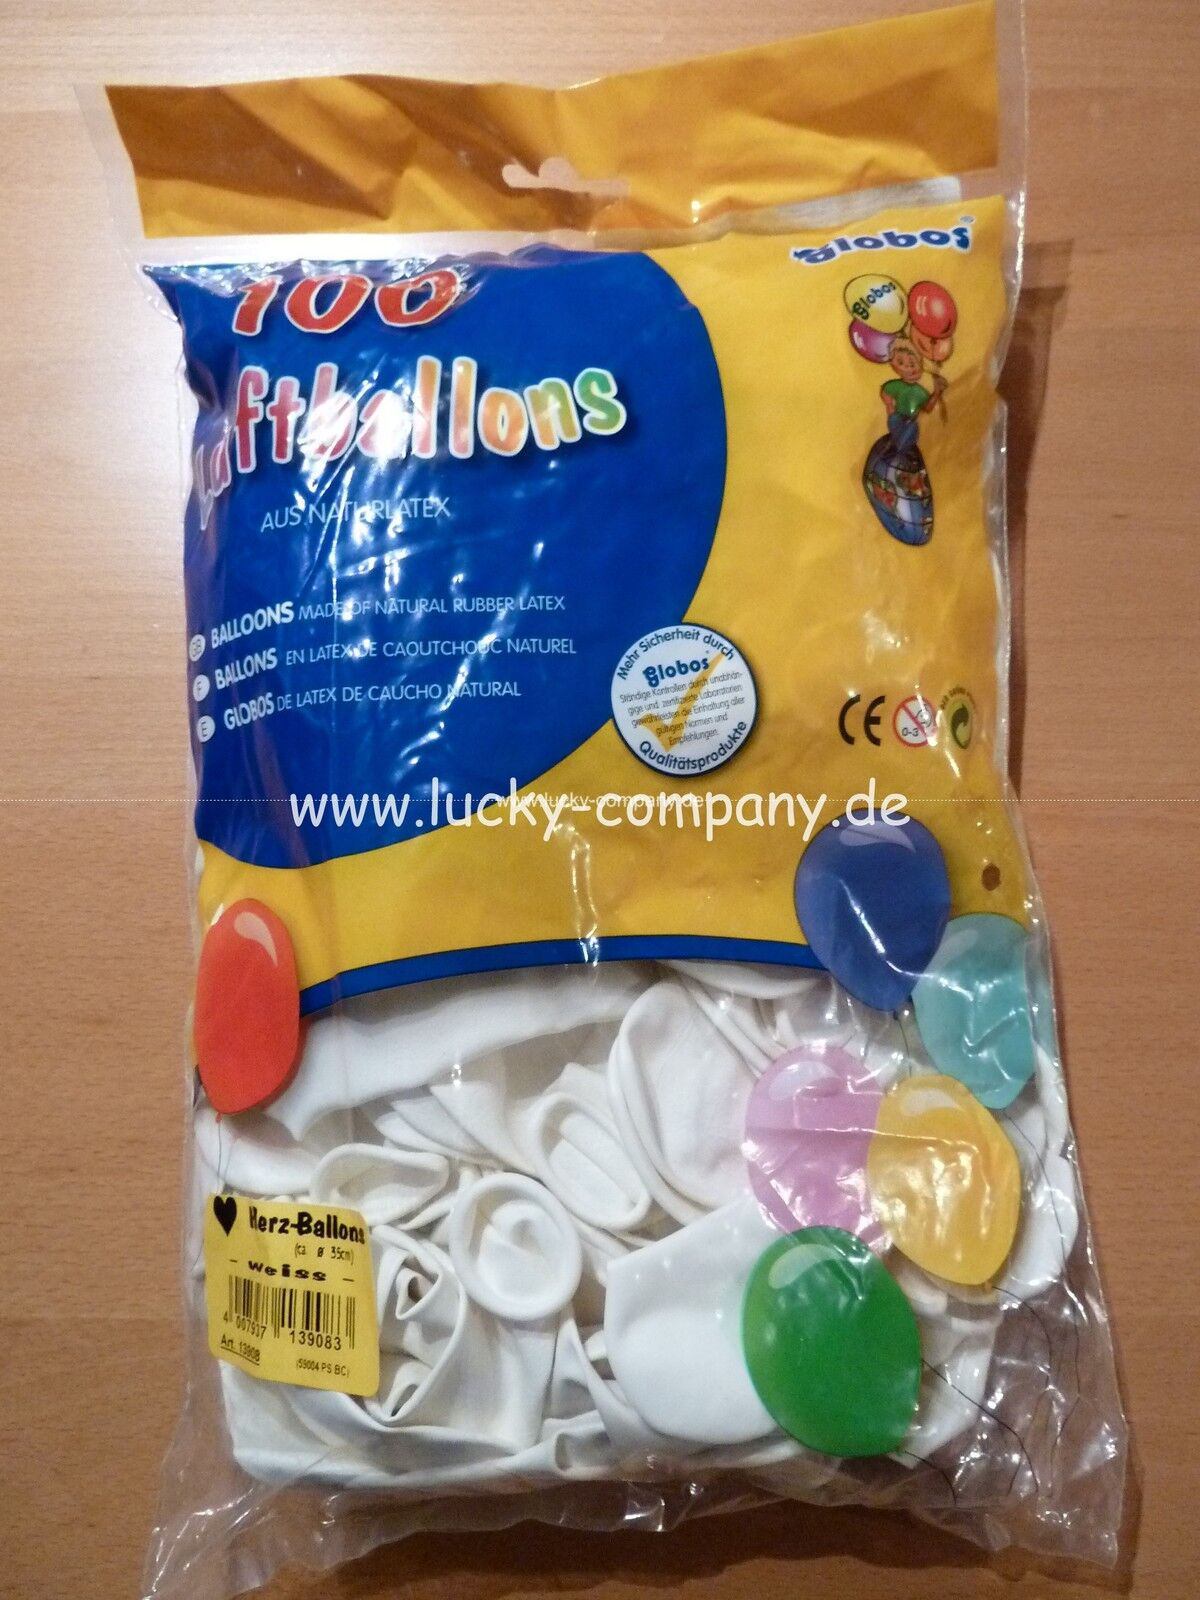 300 grosse weisse HERZBALLONS HERZ-LUFTBALLONS - Hochzeit - Ballons  FREI HAUS